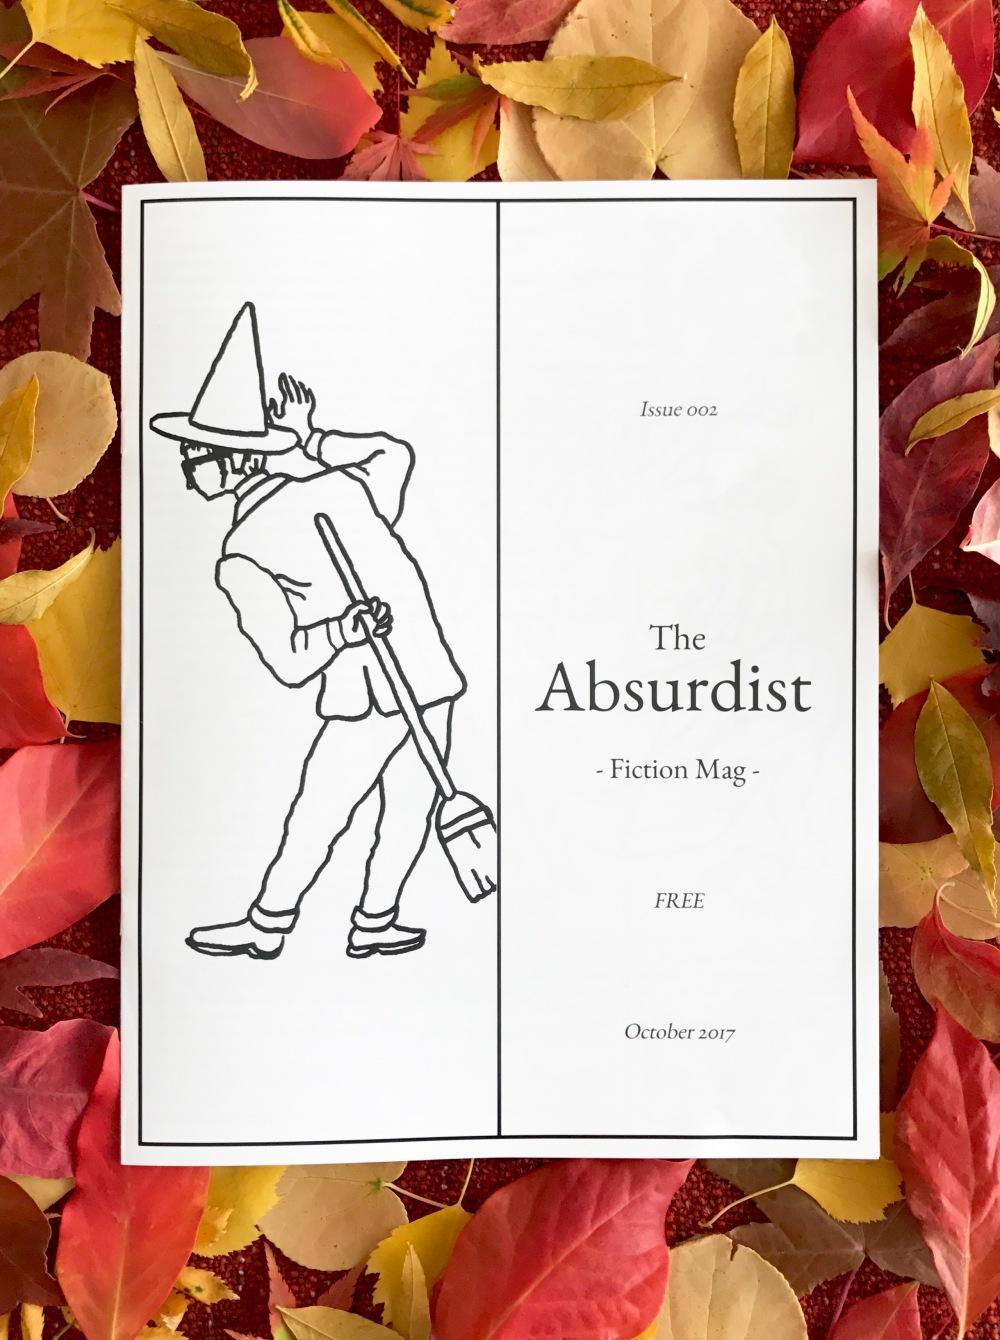 The Absurdist